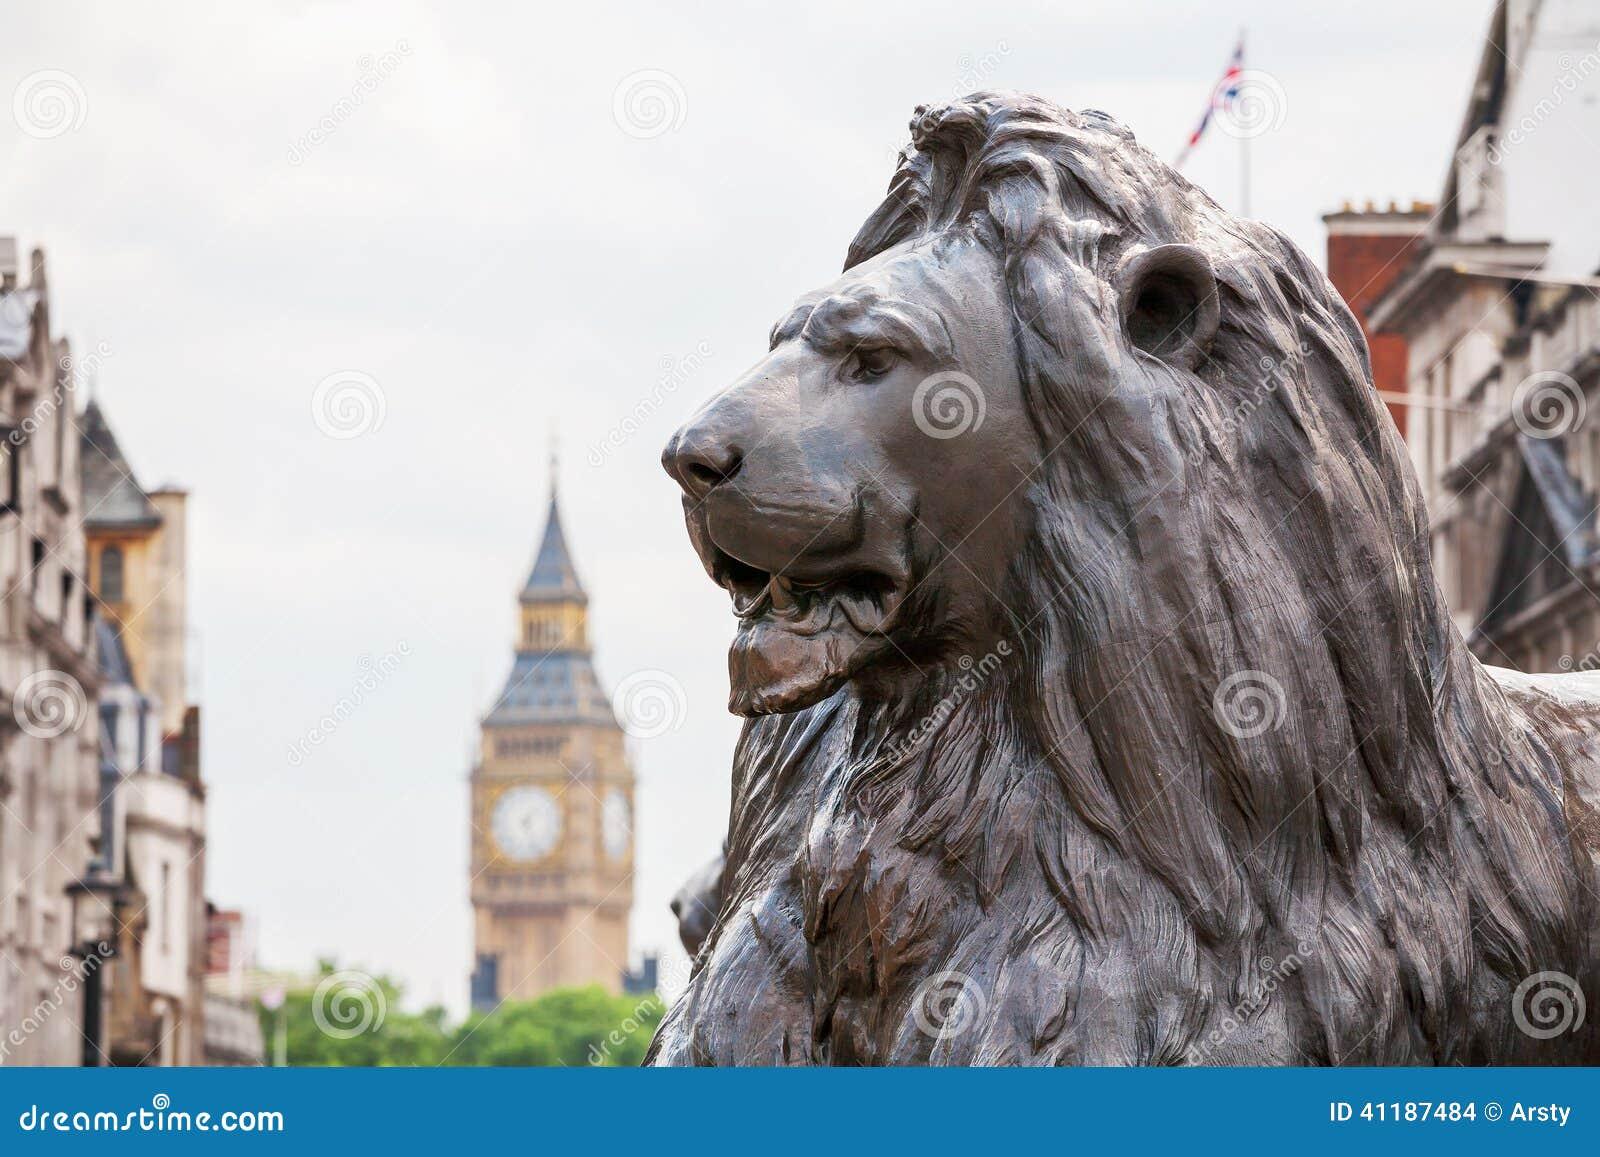 León en Trafalgar Square Londres, Inglaterra